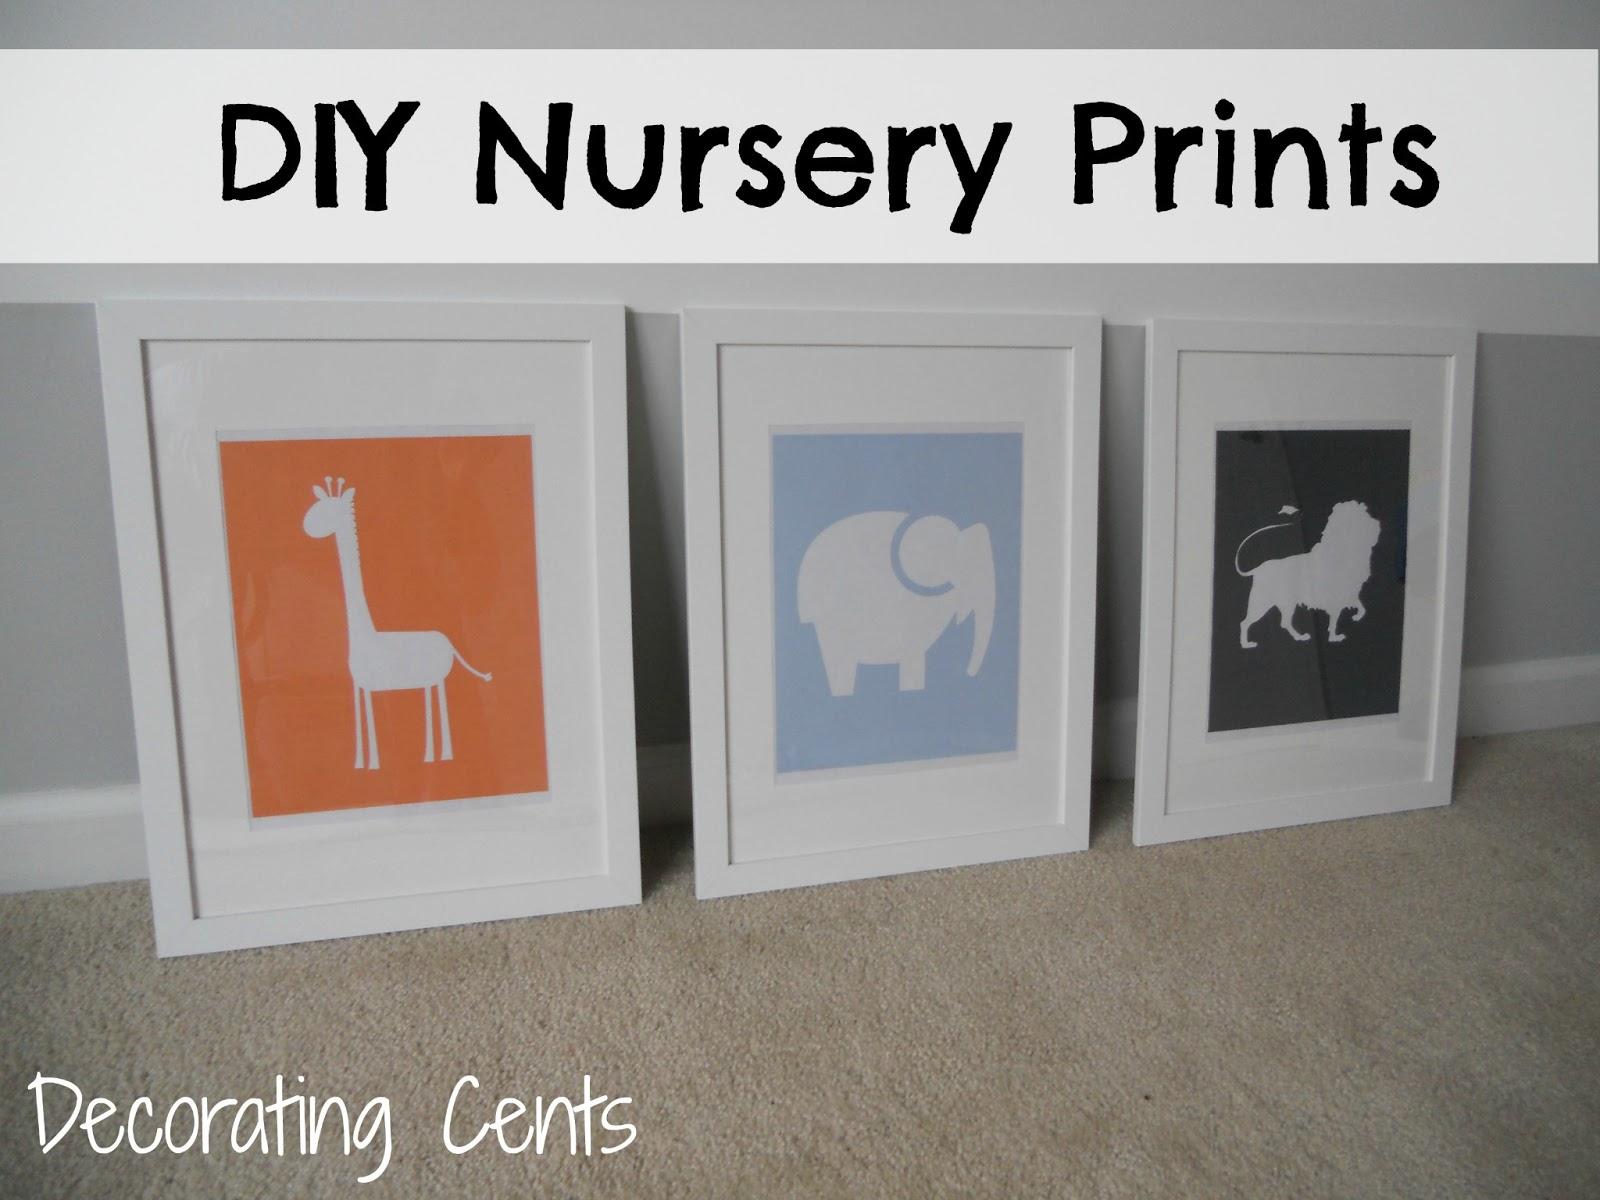 Decorating Cents: DIY Nursery Prints